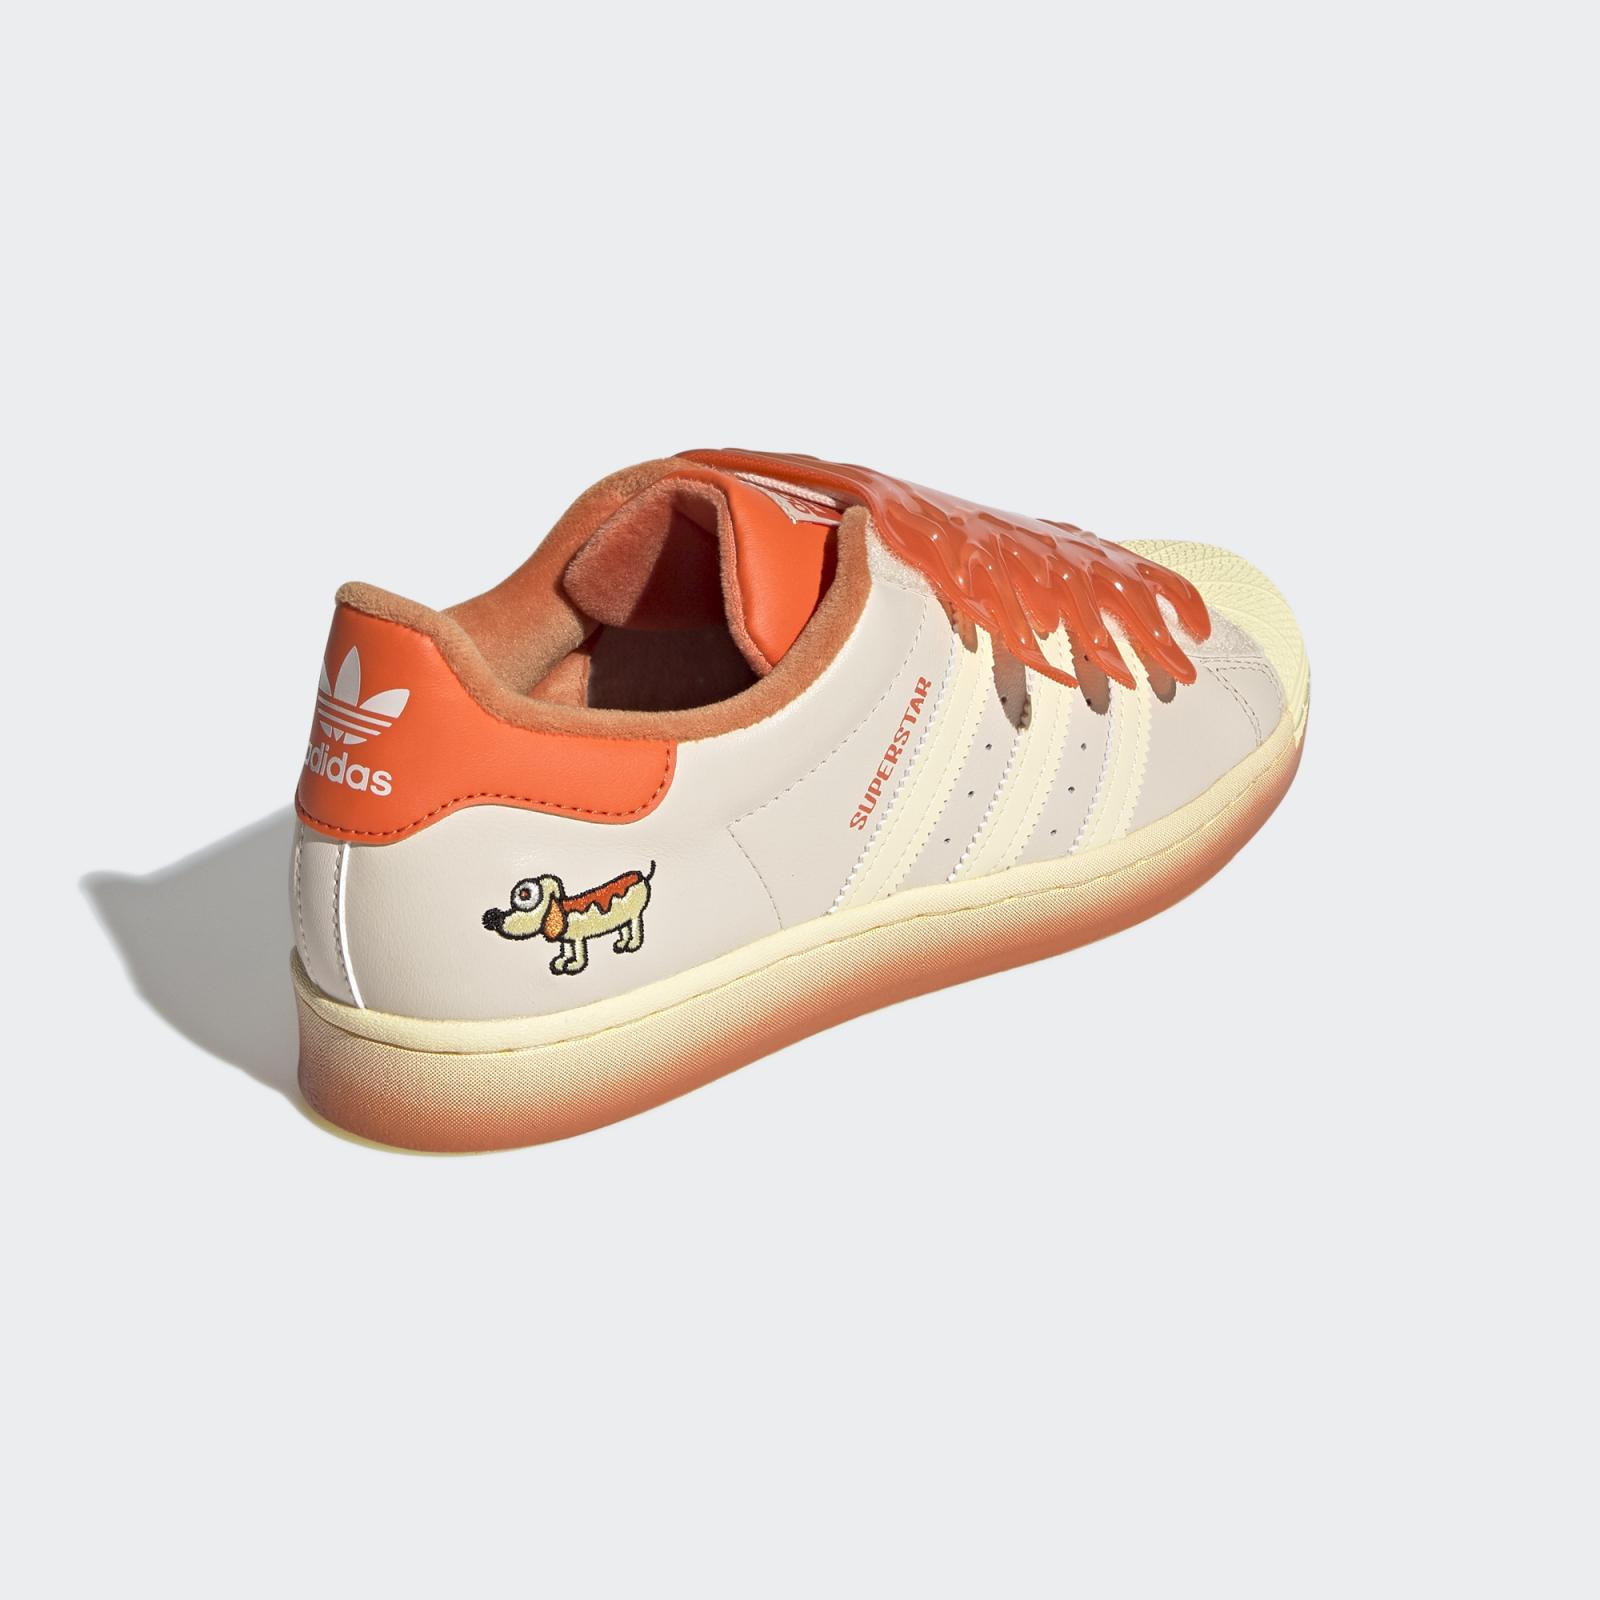 adidas Originals携手Melting Sadness发布亚麻棕/能量橙色Superstar